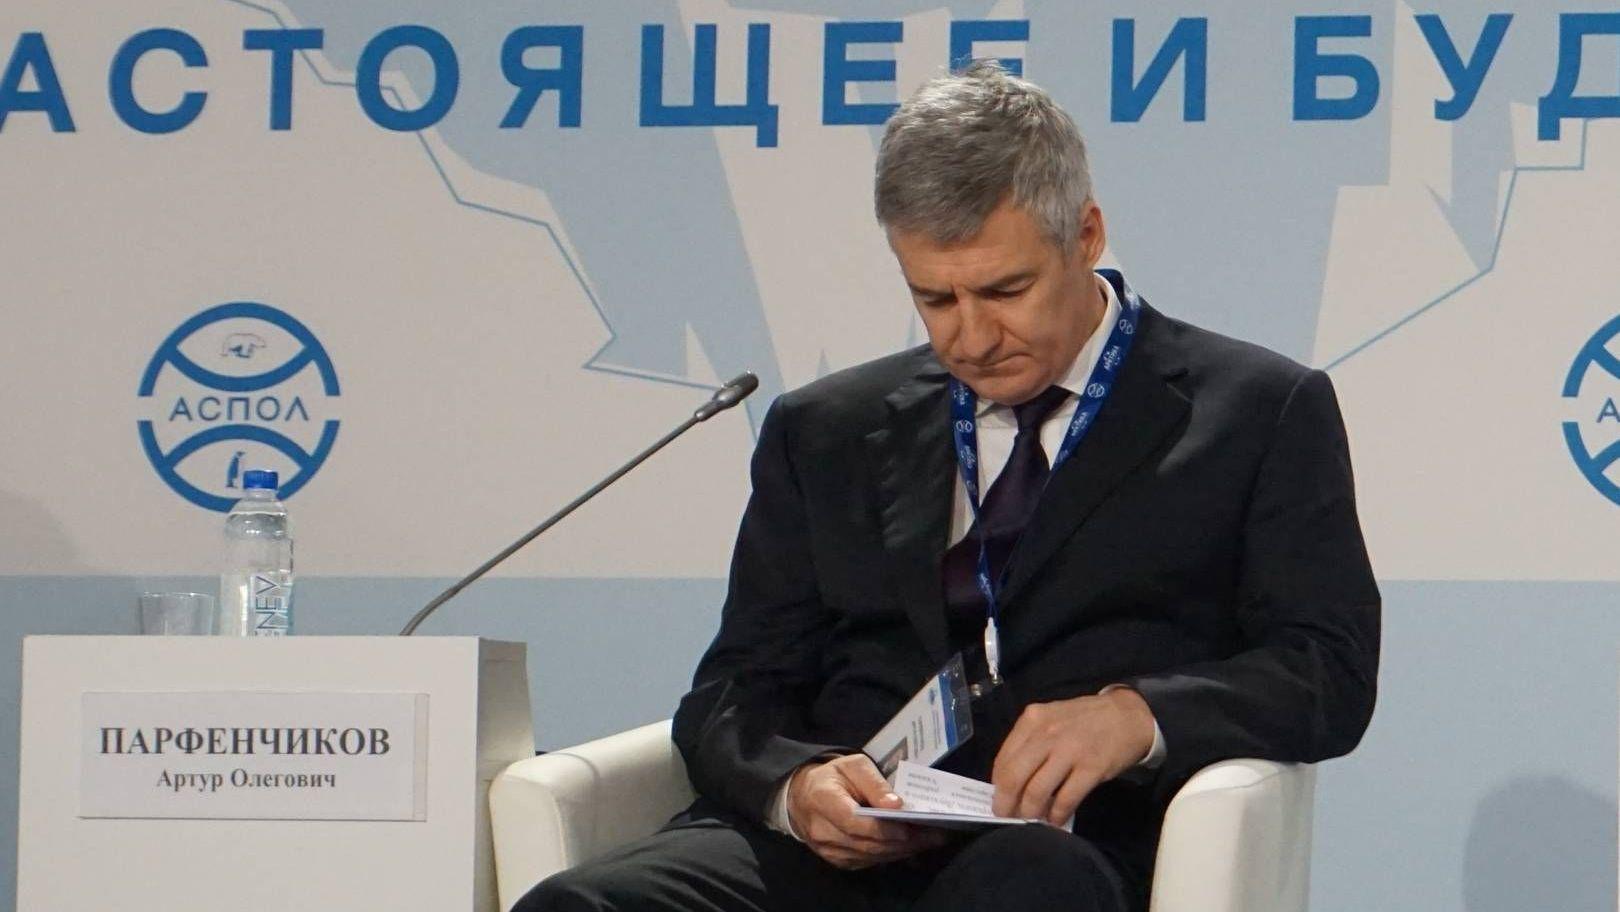 Артур Парфенчиков. Санкт-Петербург. 06.12.2018